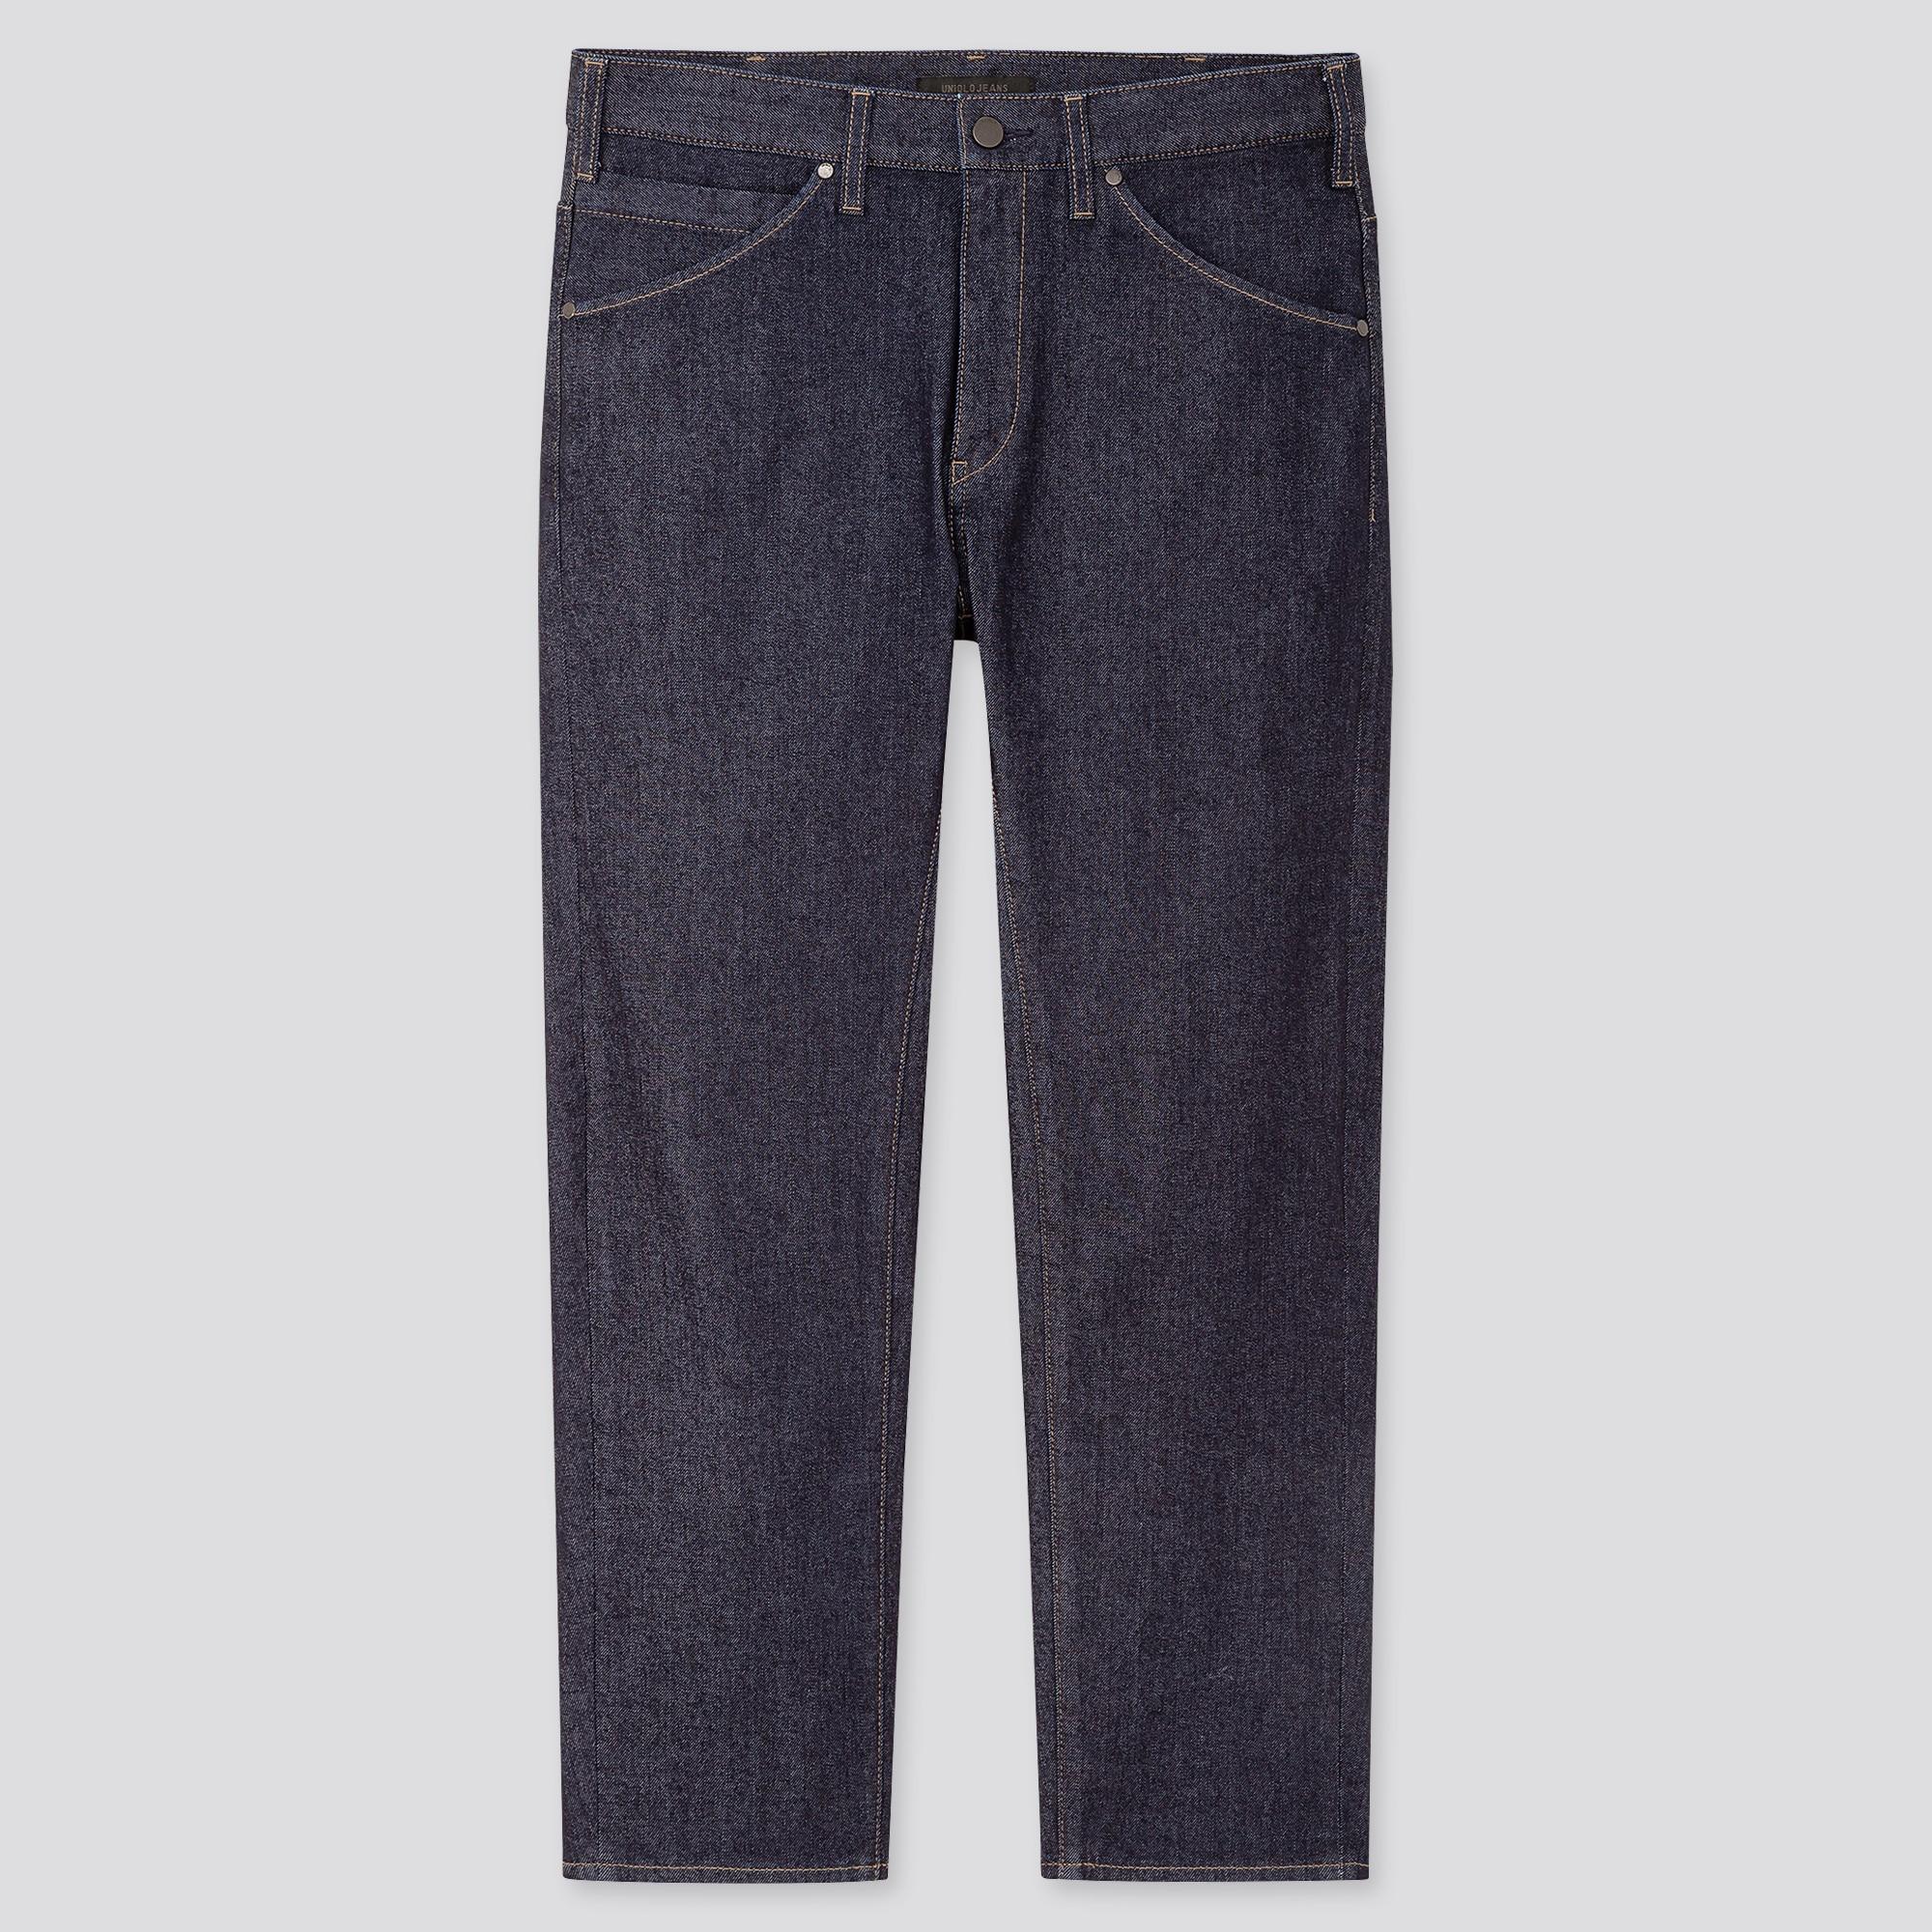 Men Ultra Light 3D Regular Fit Tapered Jeans